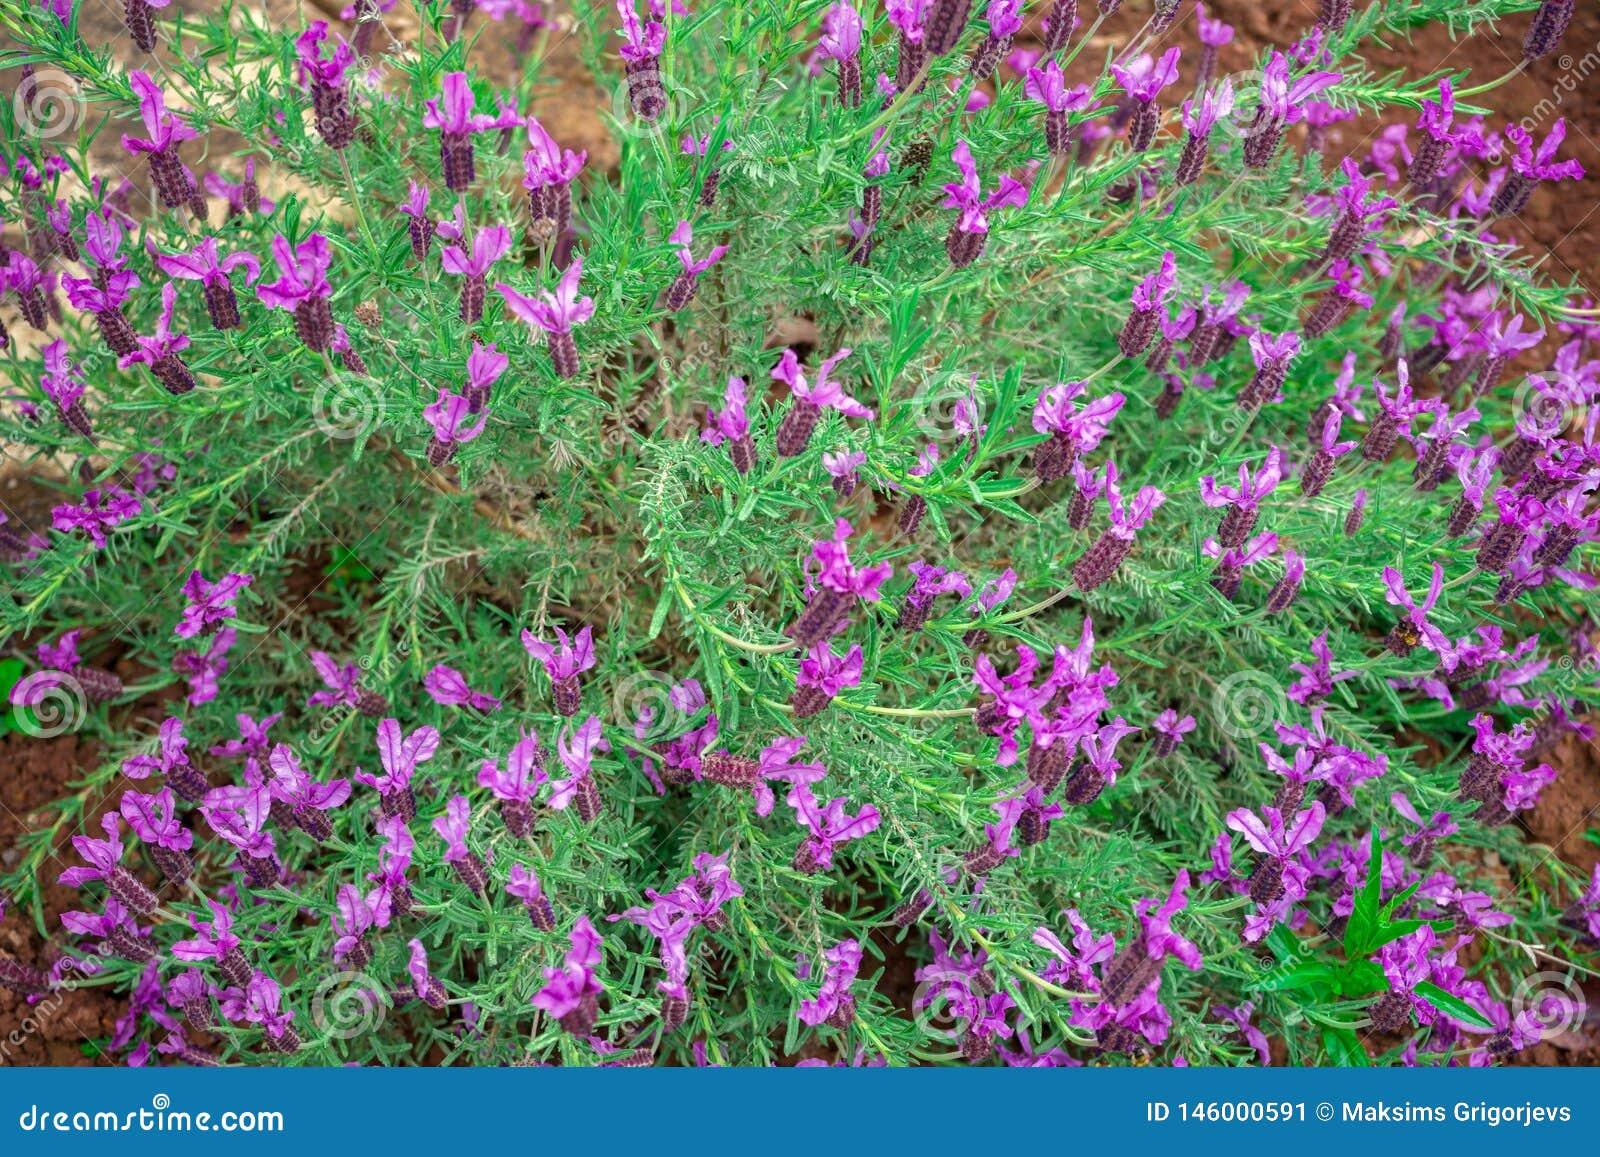 Lilalavendel, f?r lavendelblomma f?r Lavandula Angustifolia, aka gemensamt riktig blom